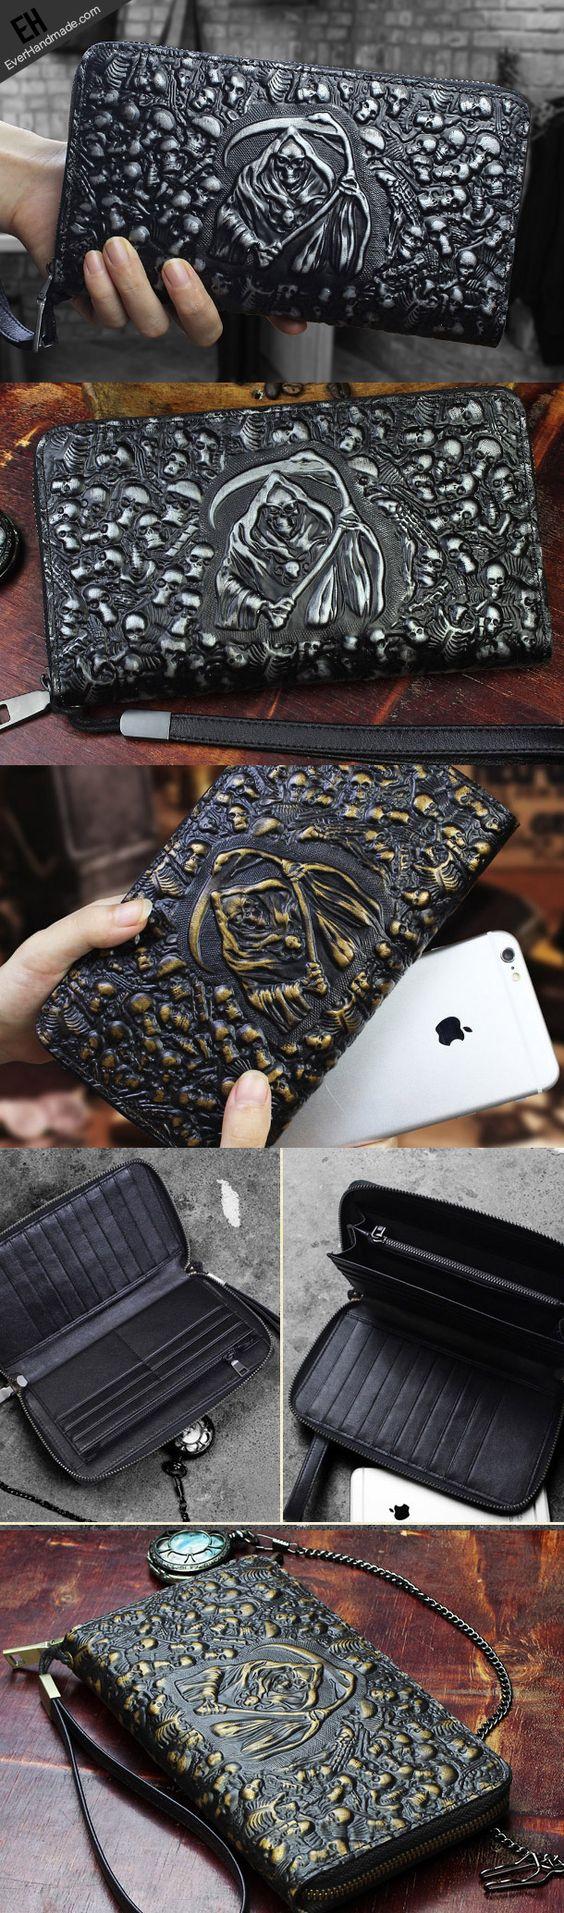 Handmade zip long wallet leather men skull death clutch phone wallet for men